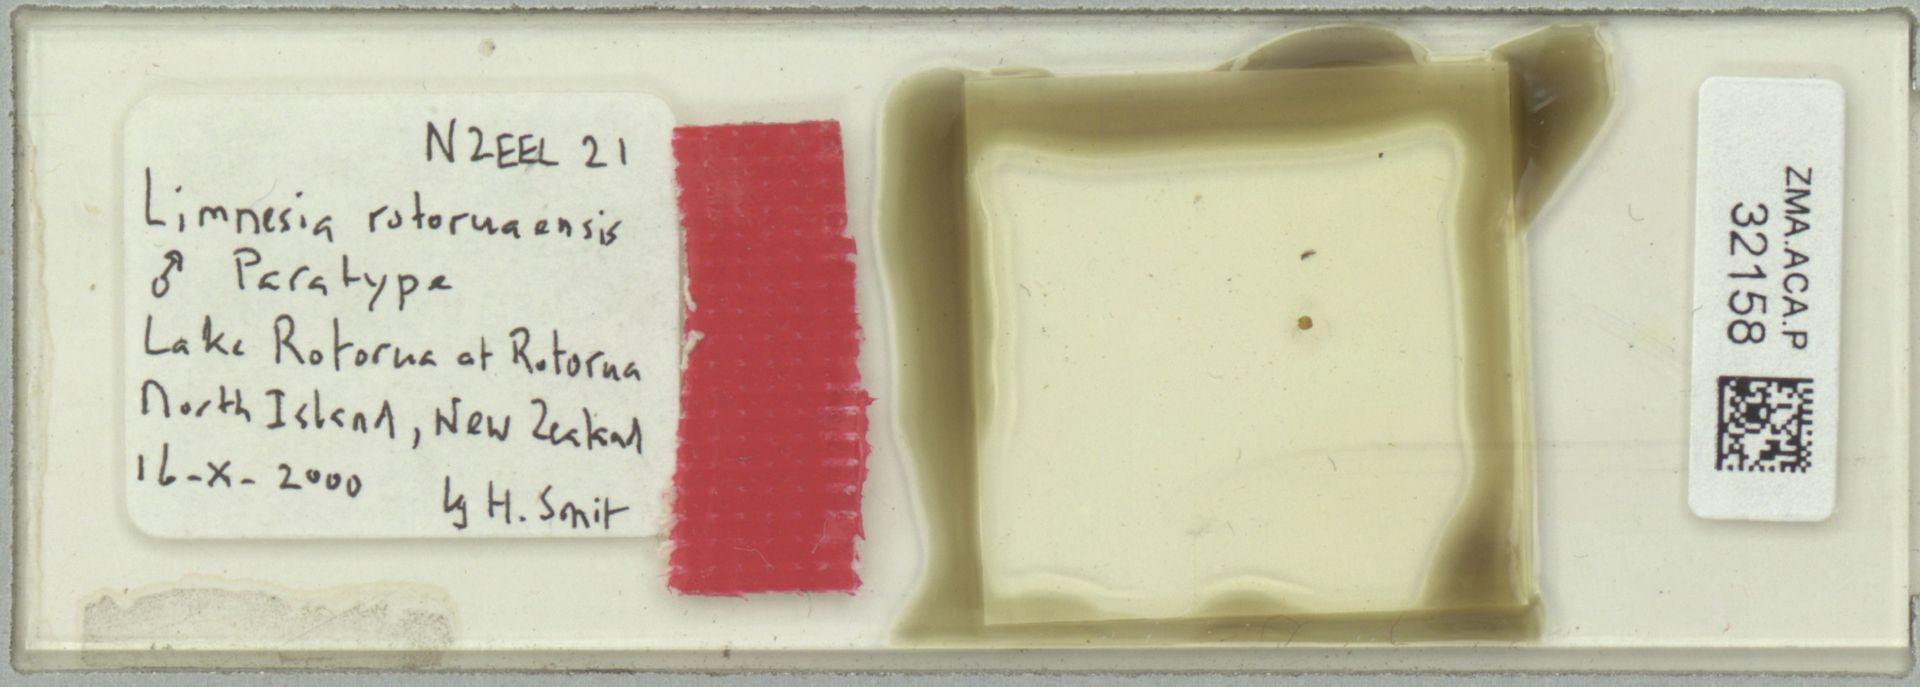 ZMA.ACA.P.32158 | Limnesia rotoruaensis Smit, 2002